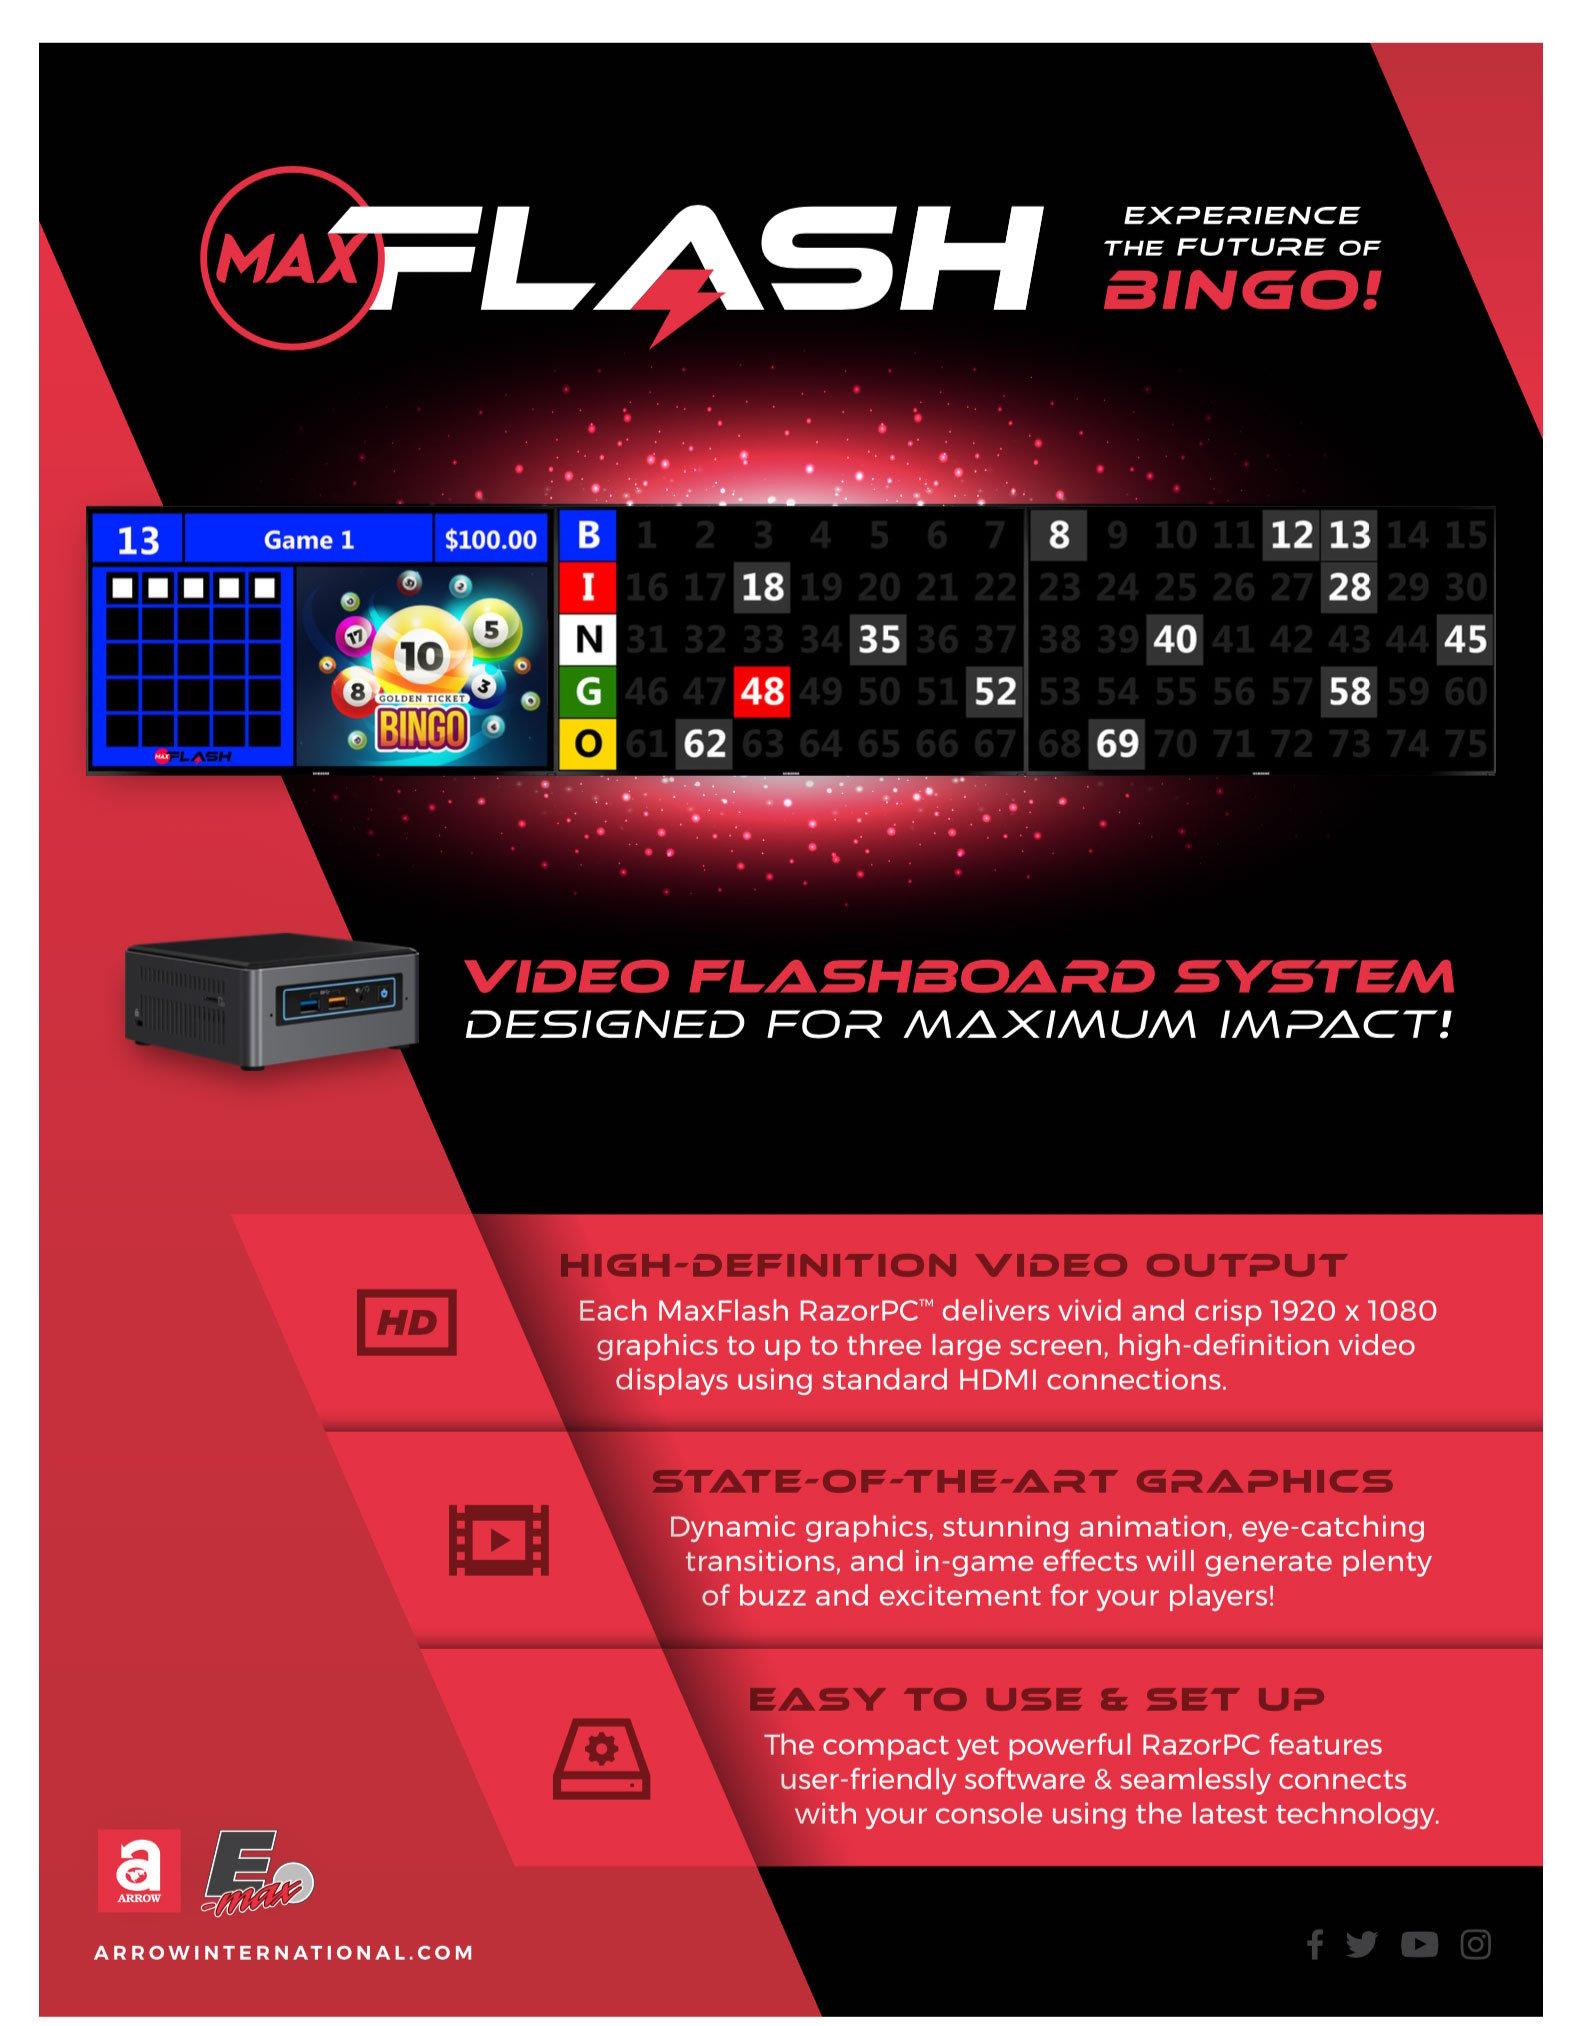 MaxFlash Flyer Promotional Materials/Equipment Flyers & Brochures